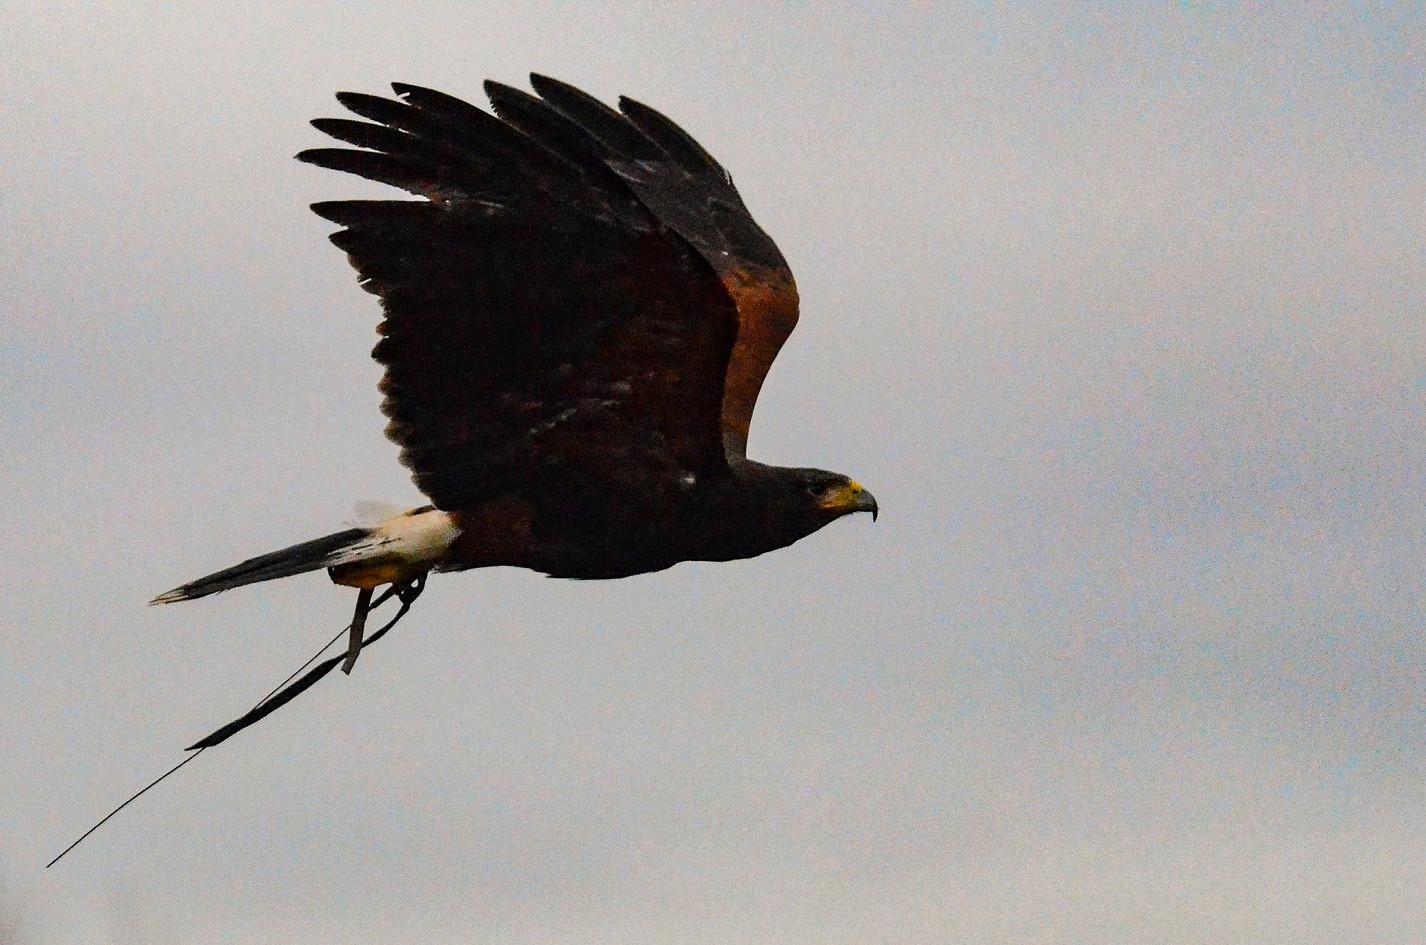 bird of prey pest control coventry